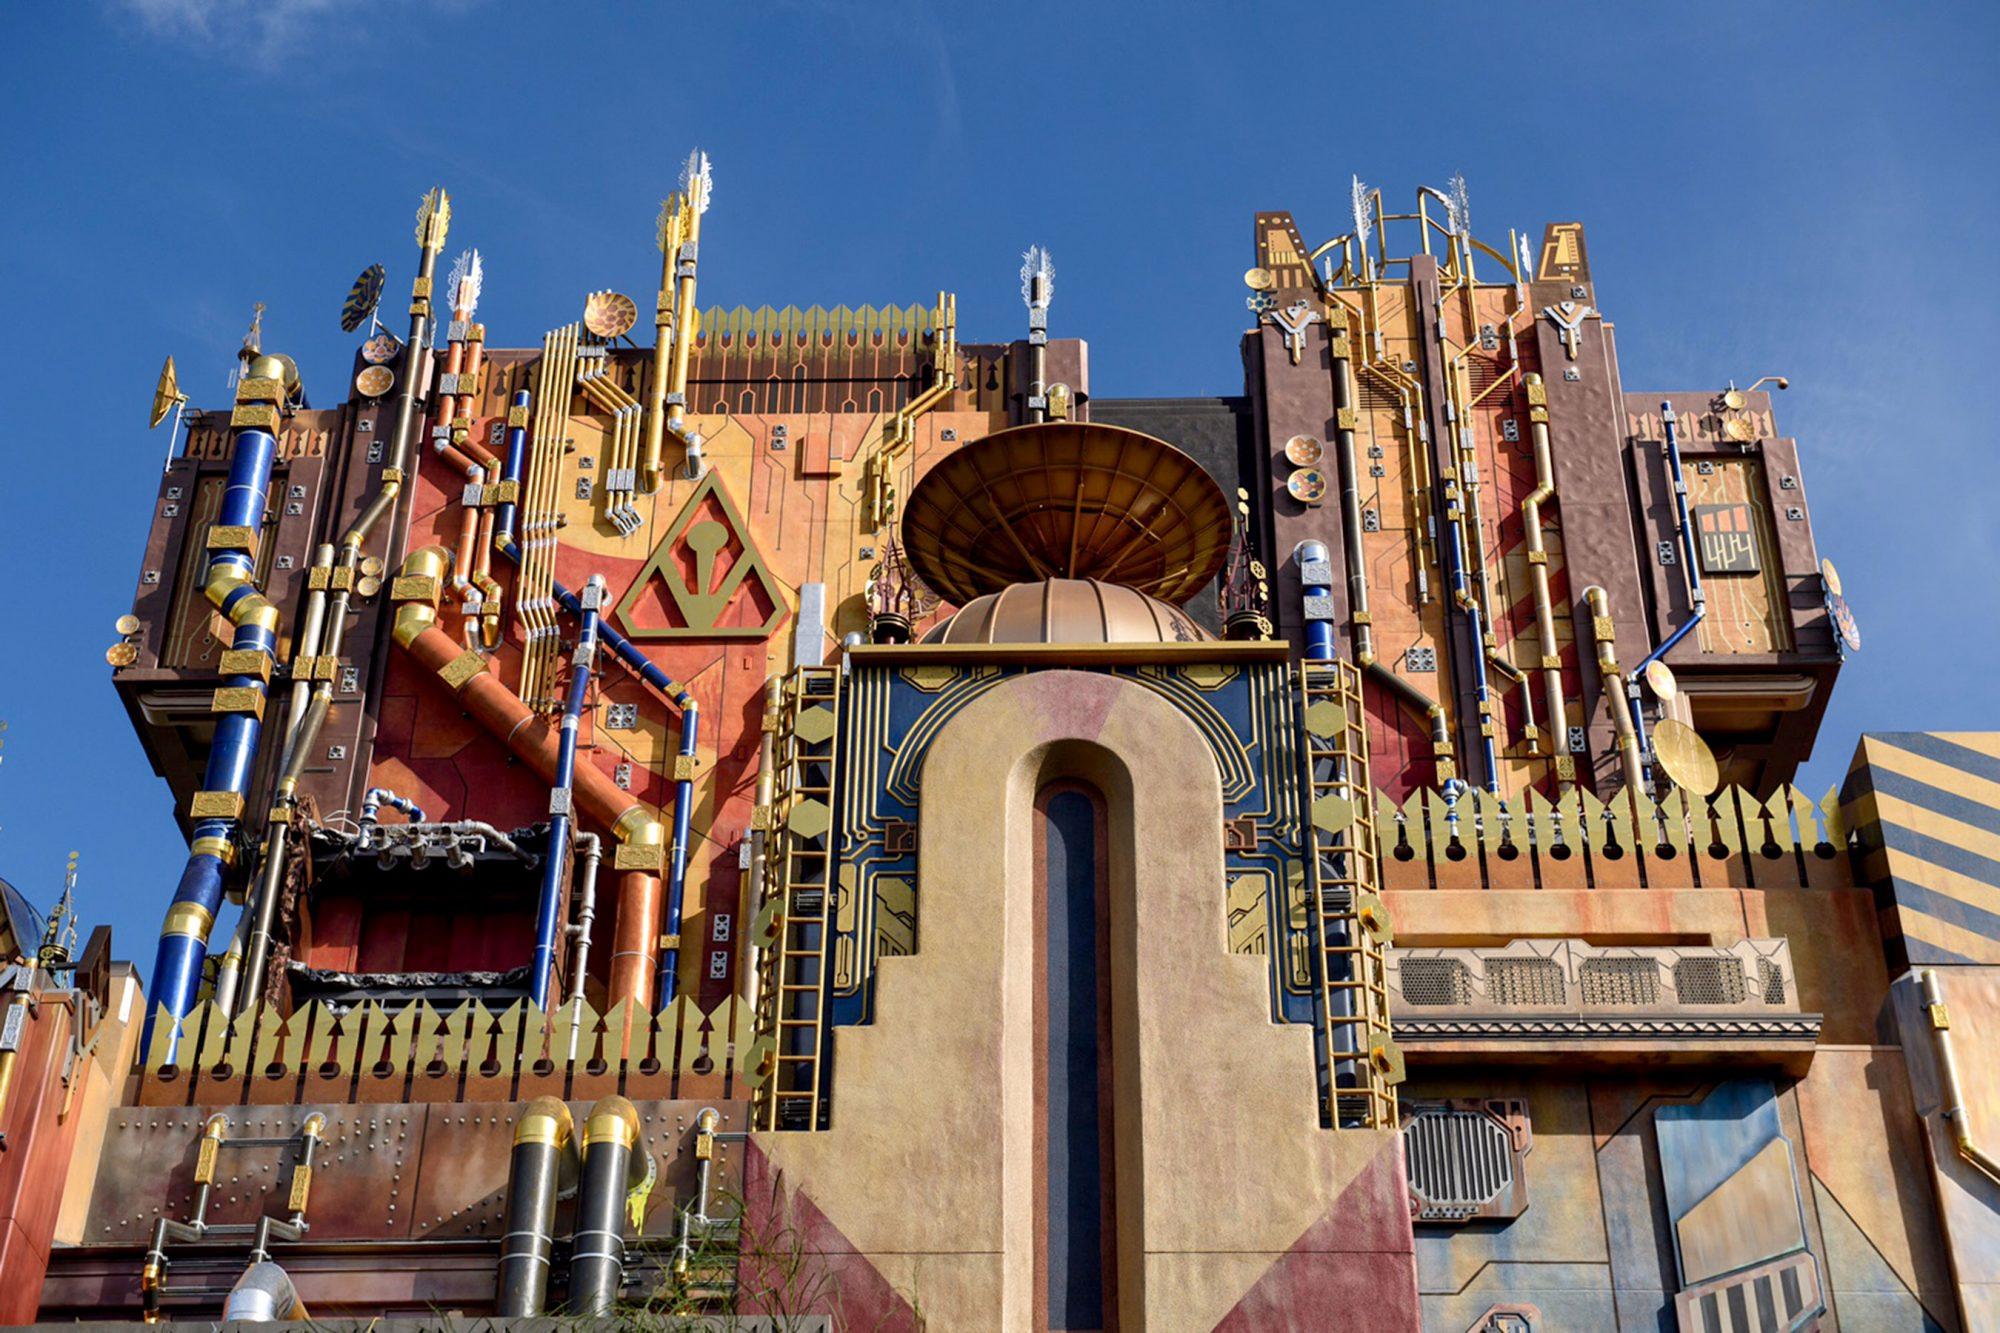 Guardians of the Galaxy Ride at Disneyland